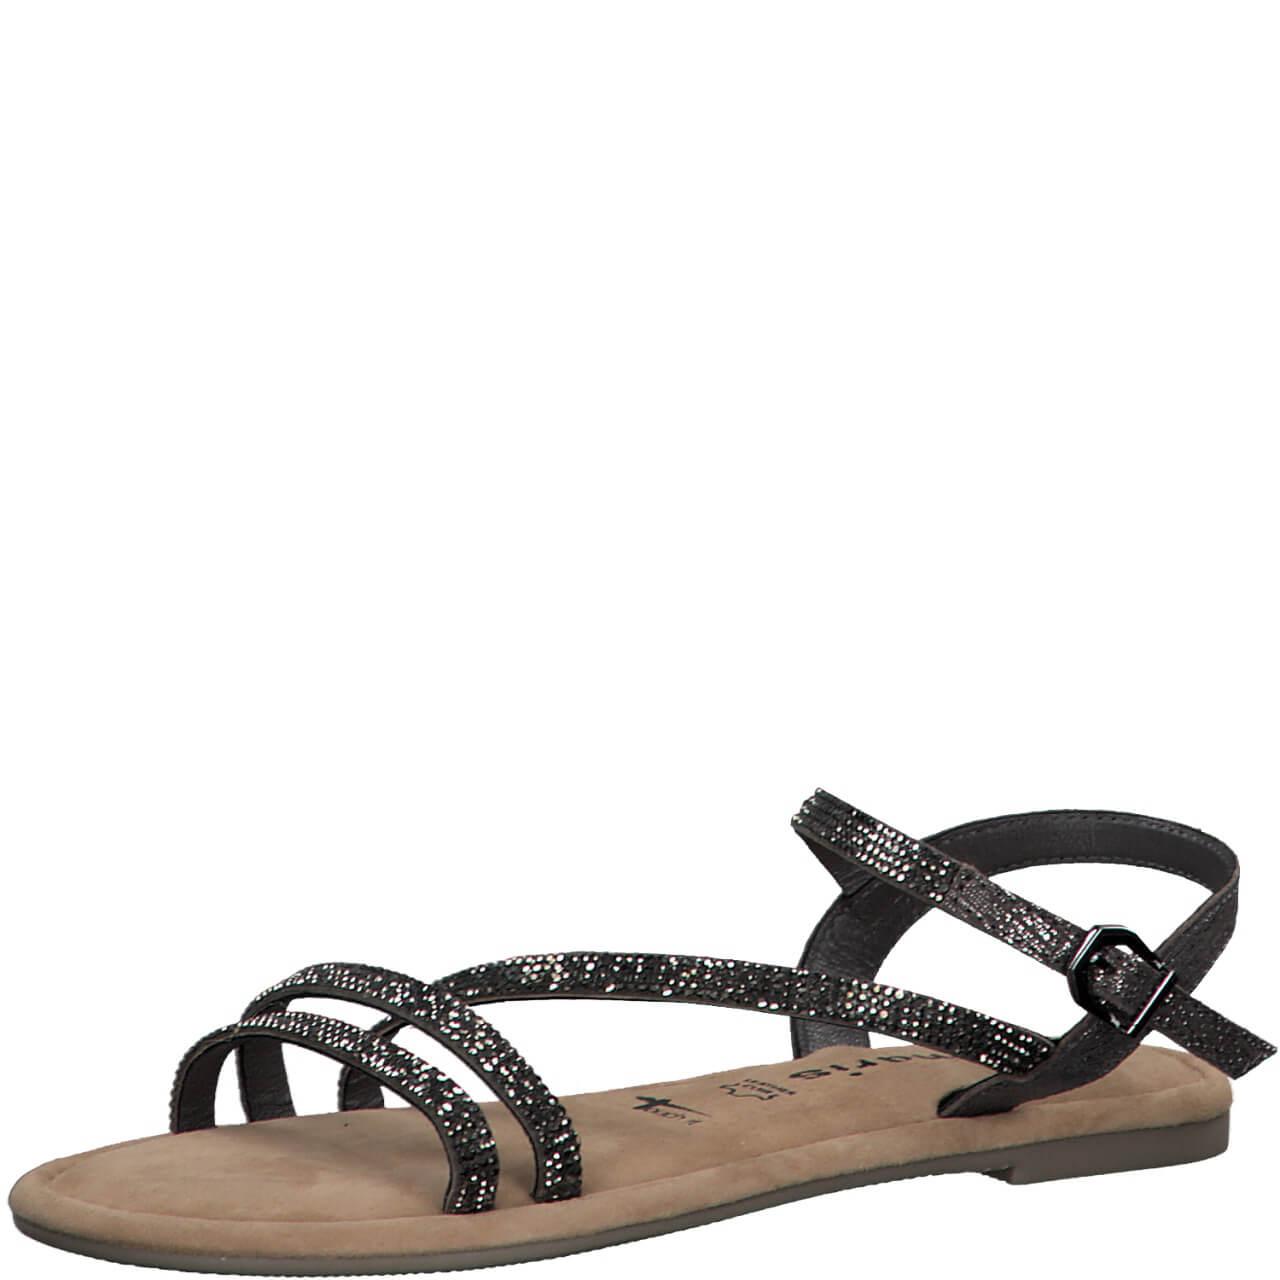 Pewter sandals